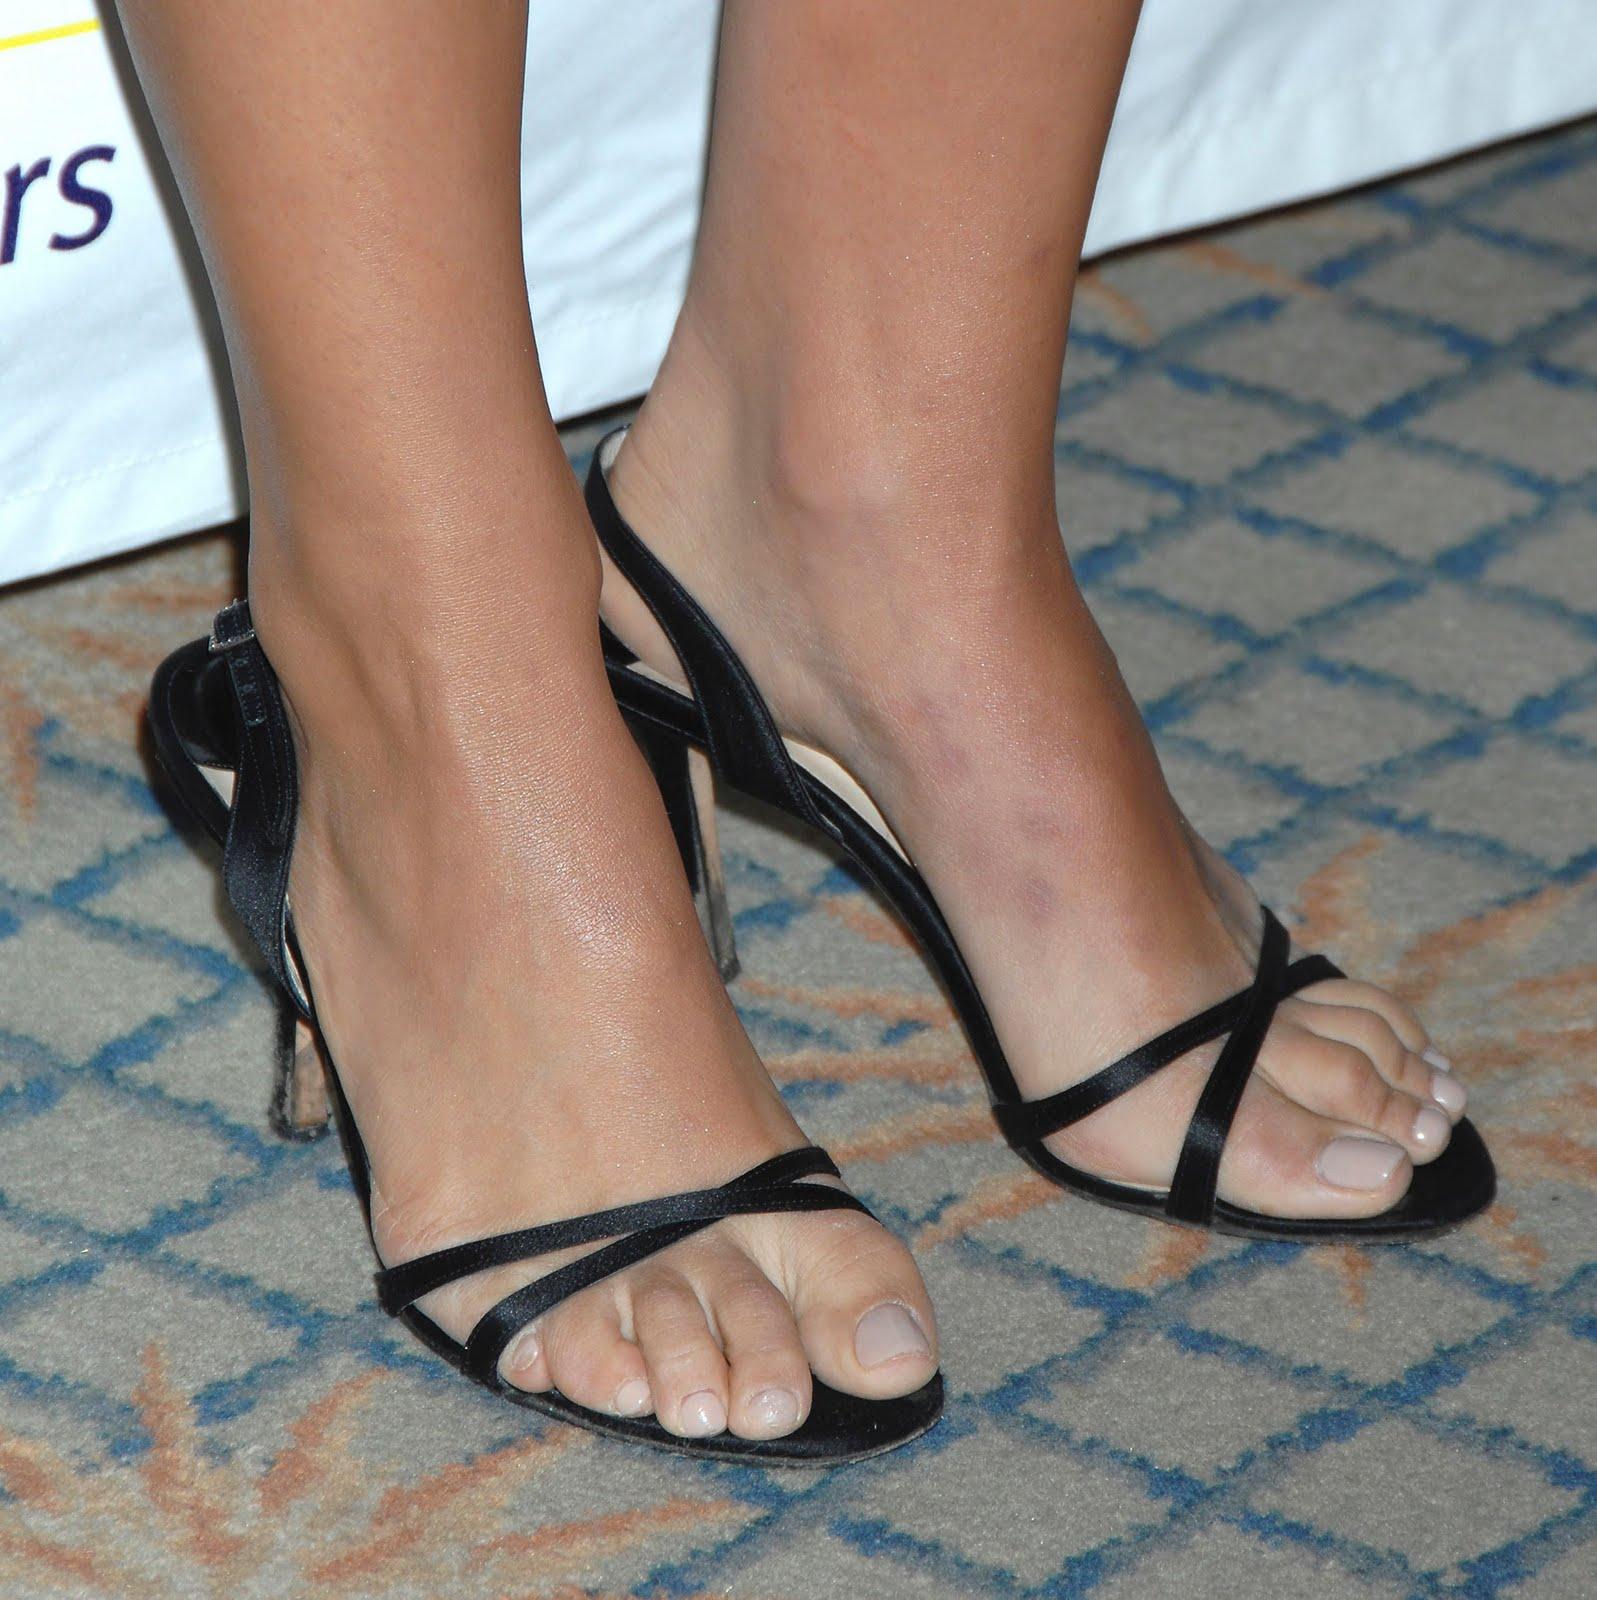 http://4.bp.blogspot.com/_lKe2XK1kSnY/S628TZErwoI/AAAAAAAABm0/p_0D8FR_1jY/s1600/natalie-portman-feet.jpg